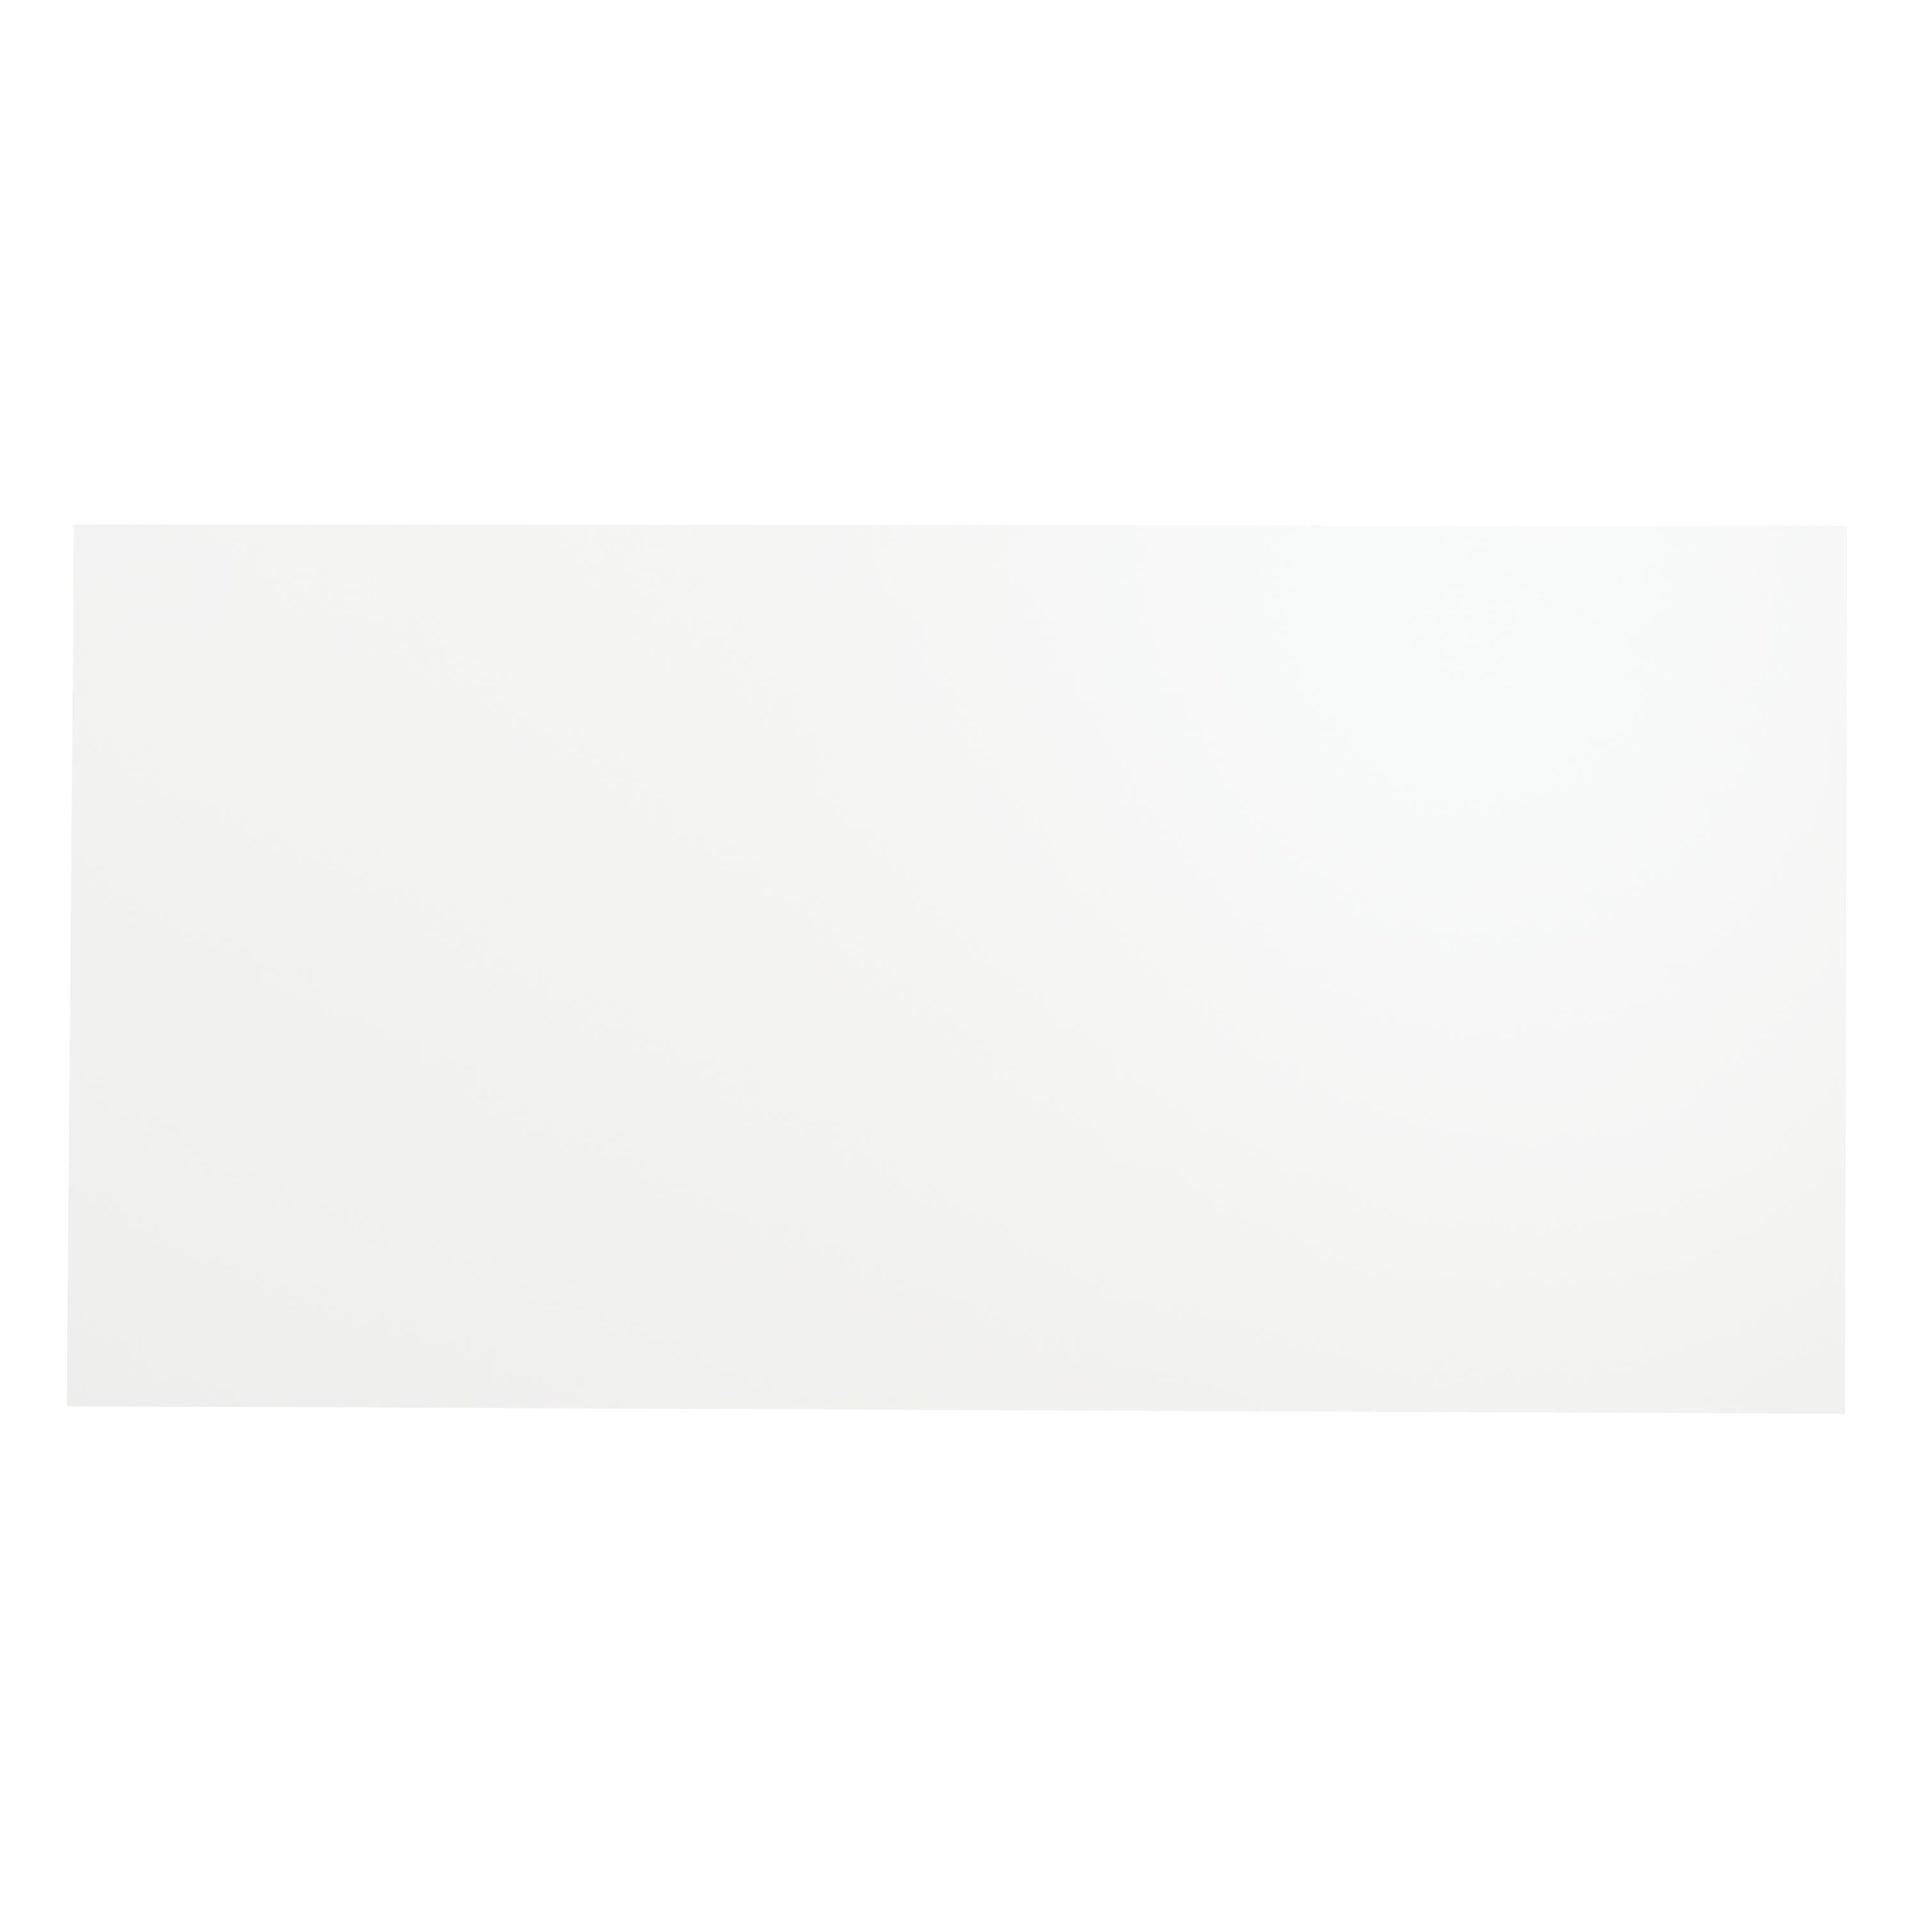 Piastrella per rivestimenti Arctic 30 x 60 cm sp. 9 mm bianco - 3